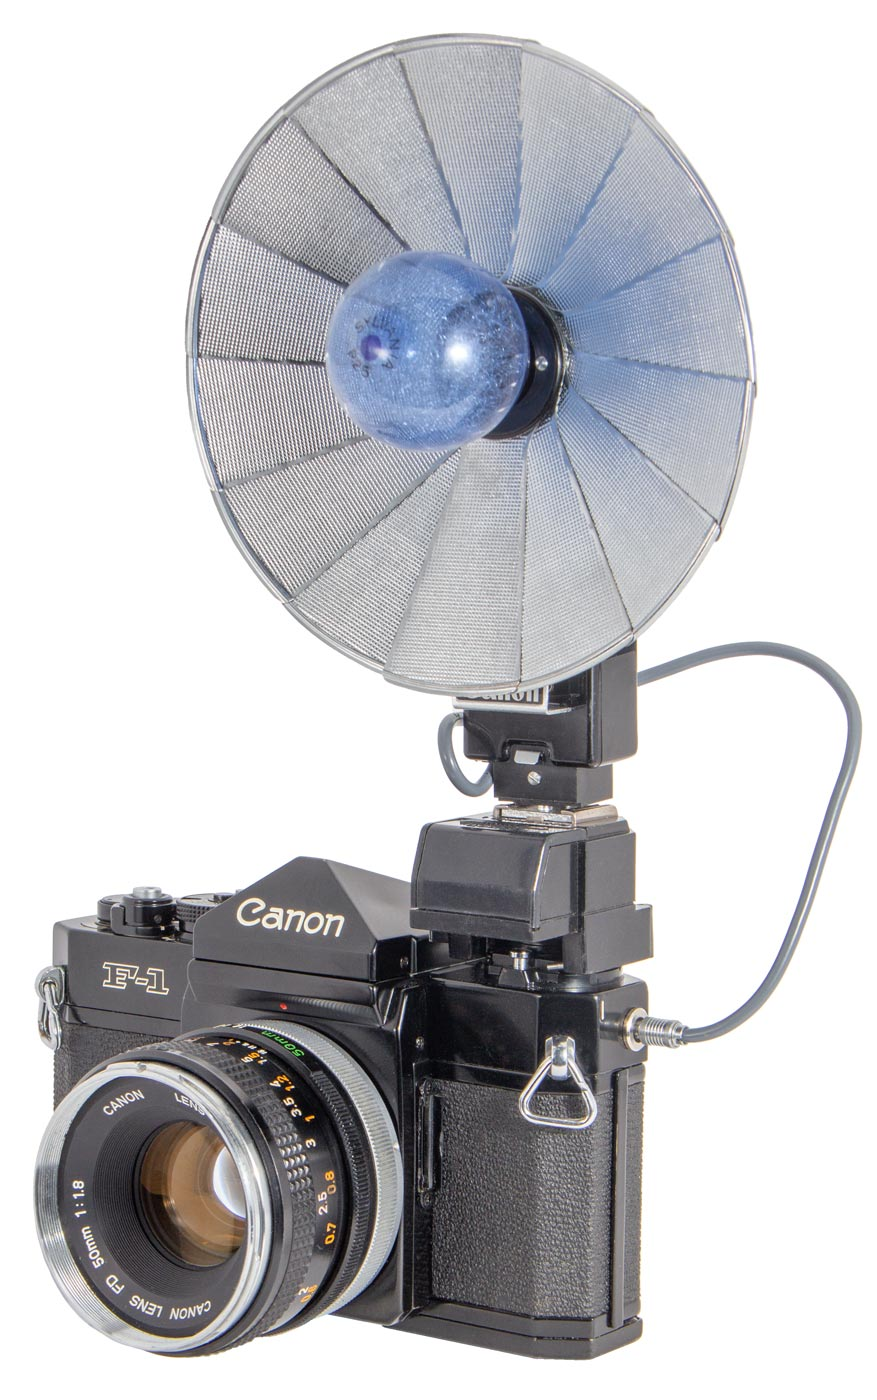 Canon F1 Flash Coupler